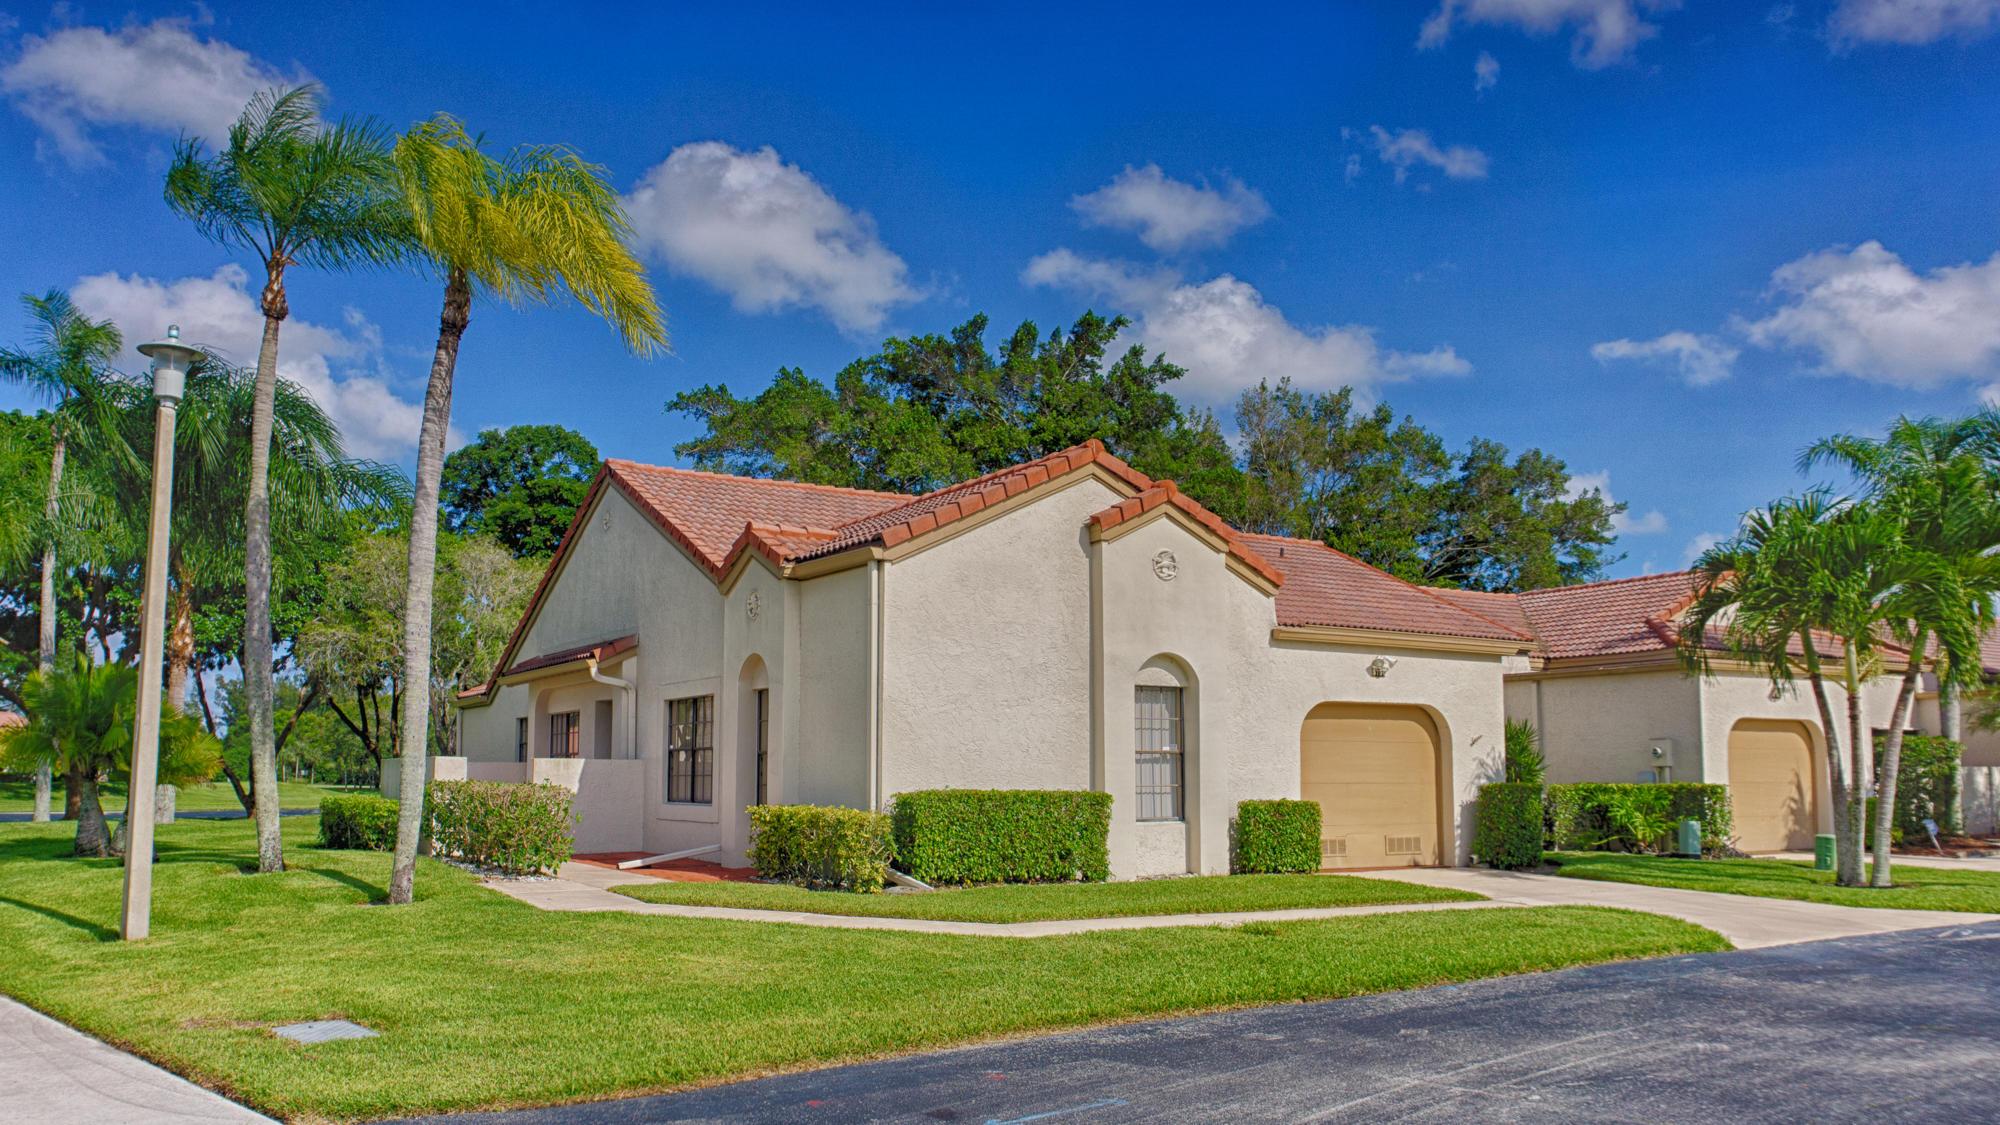 Photo of 5754 Parkwalk Circle W, Boynton Beach, FL 33472